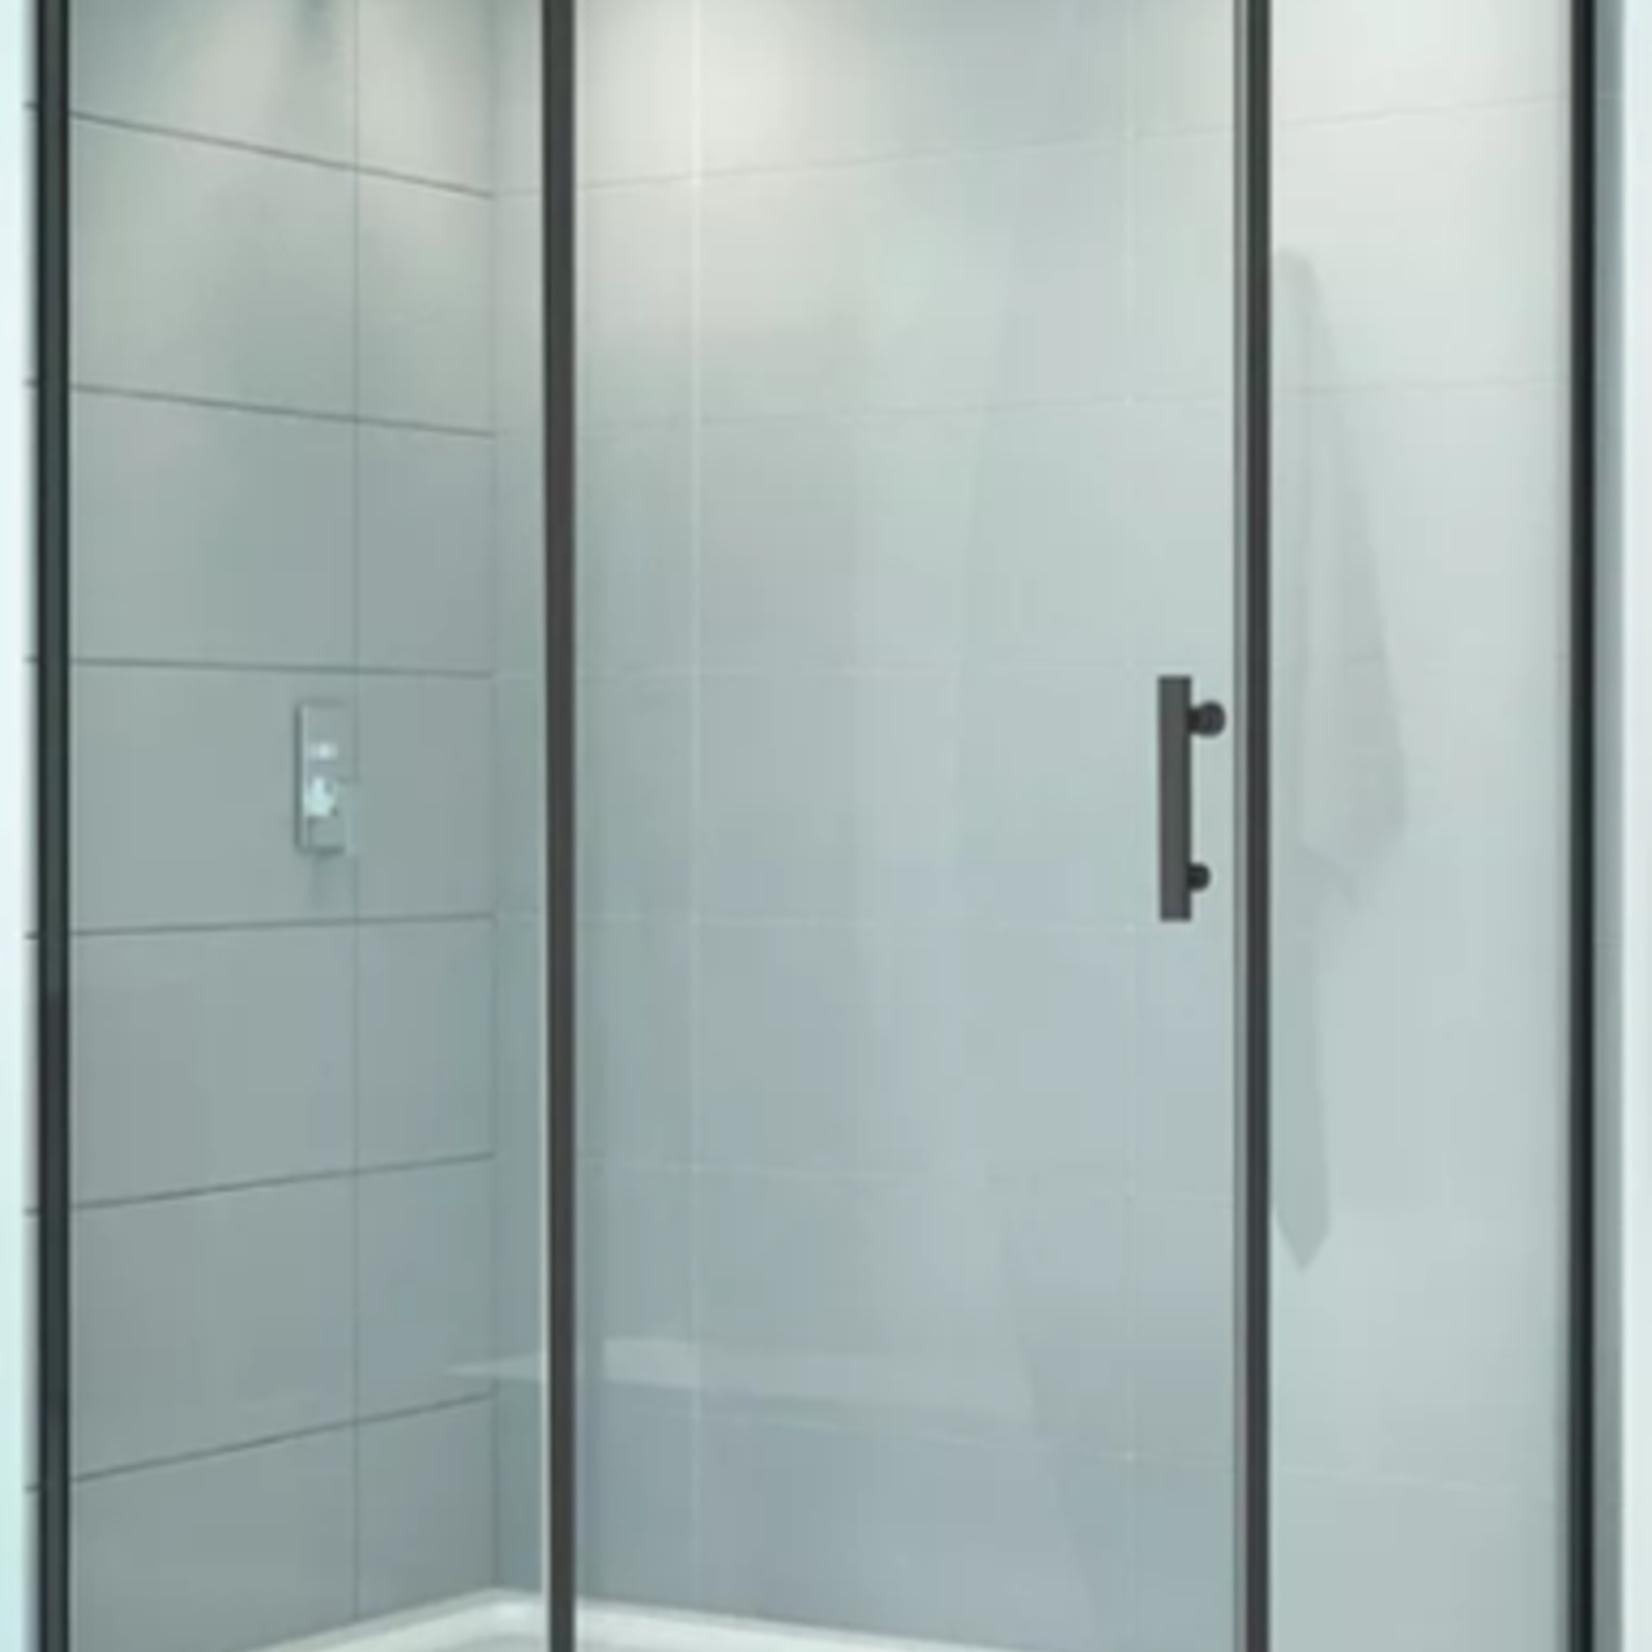 Reversible shower set 36x60 black Quartz series CDC